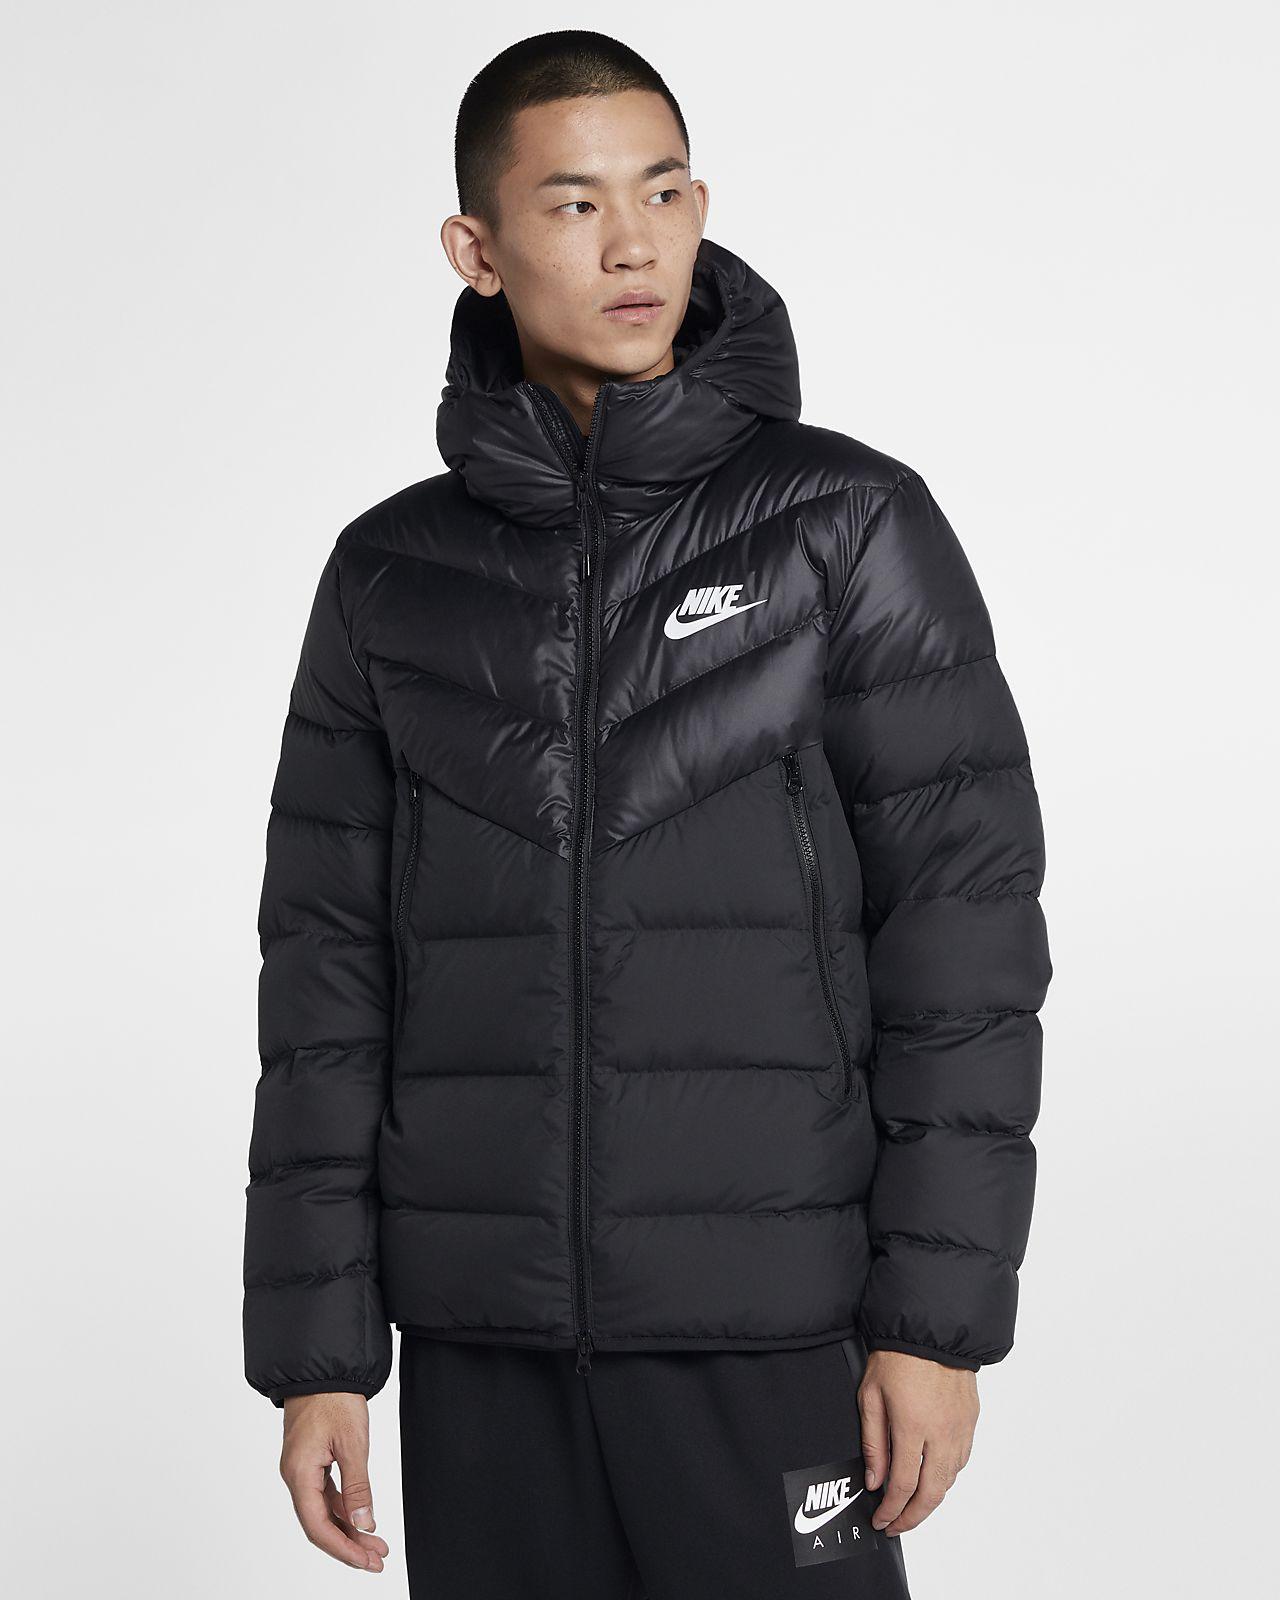 Nike – Jacke mit Kapuze – Schwarz